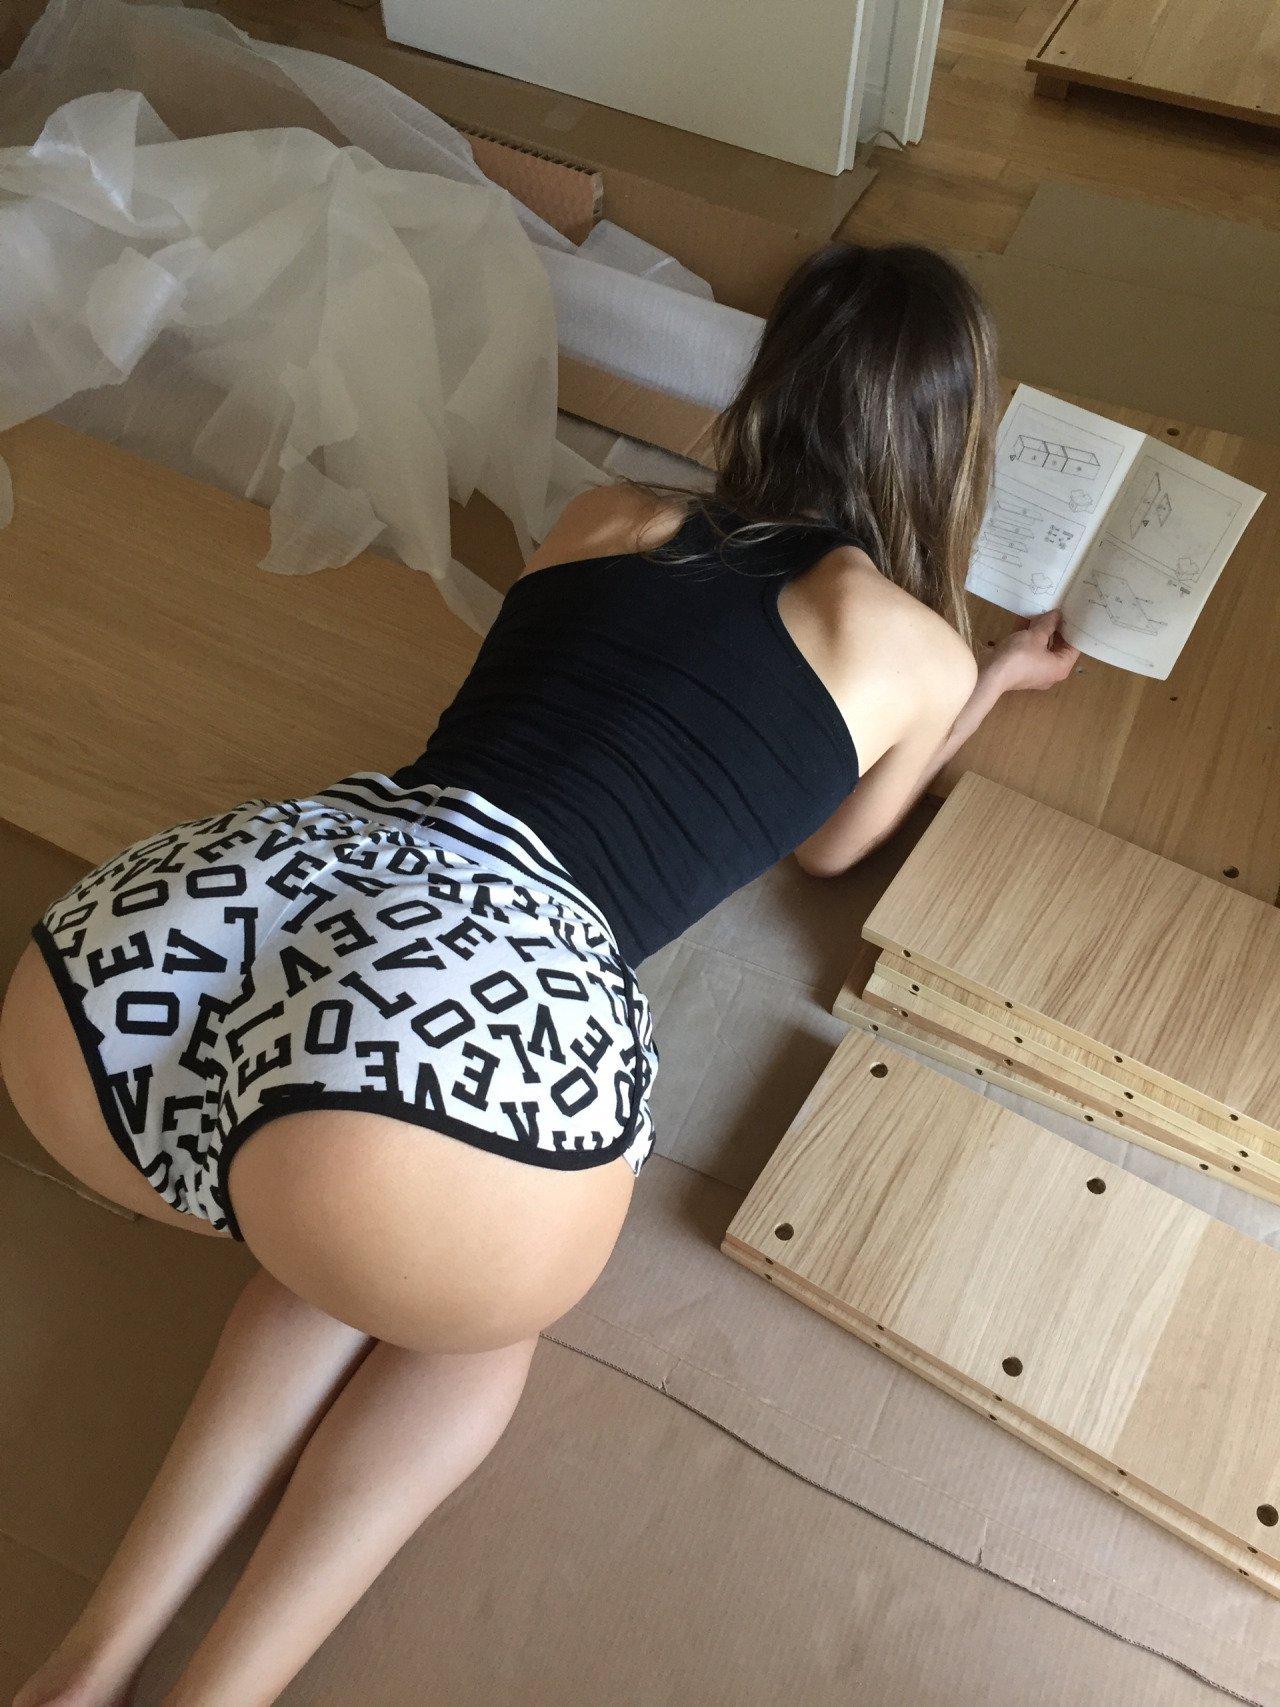 9-porno.ru Попа тети фото